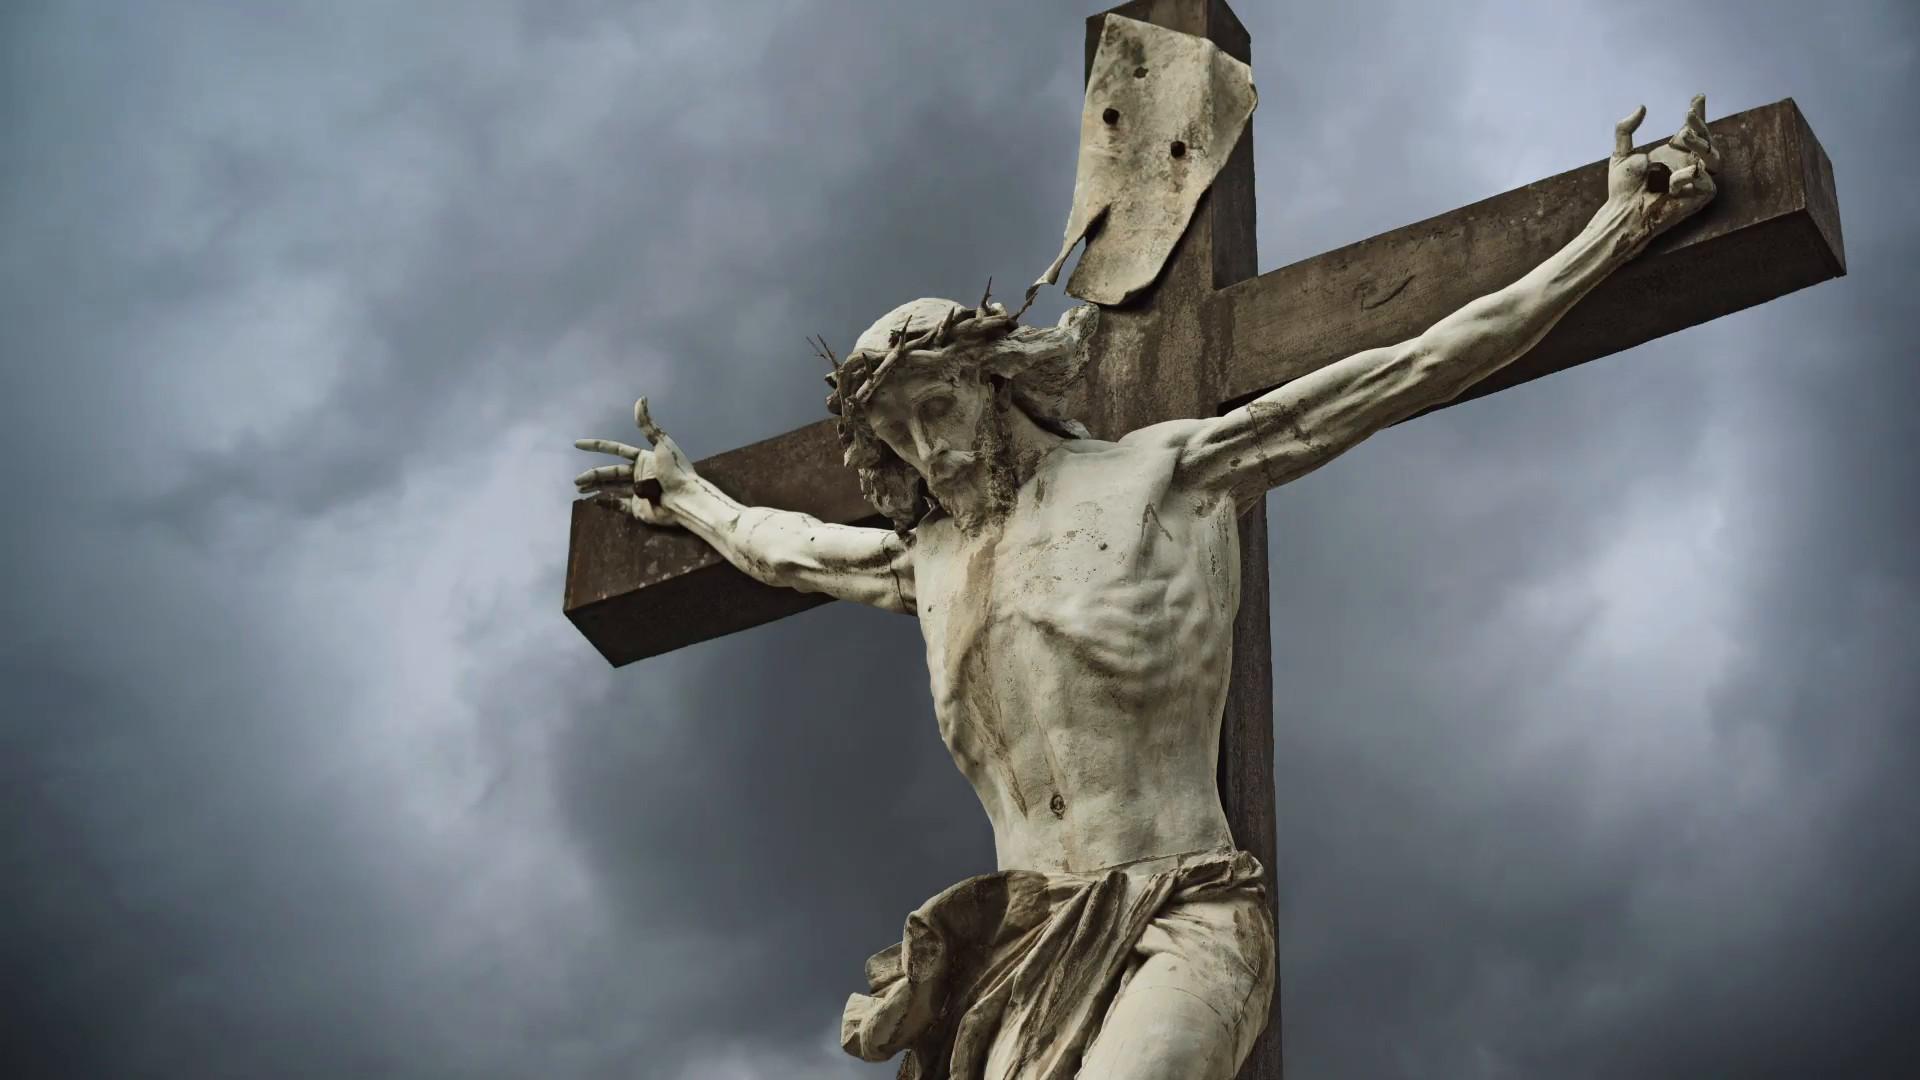 Crucifixion wallpaper 54 images - Jesus hd 1080p ...